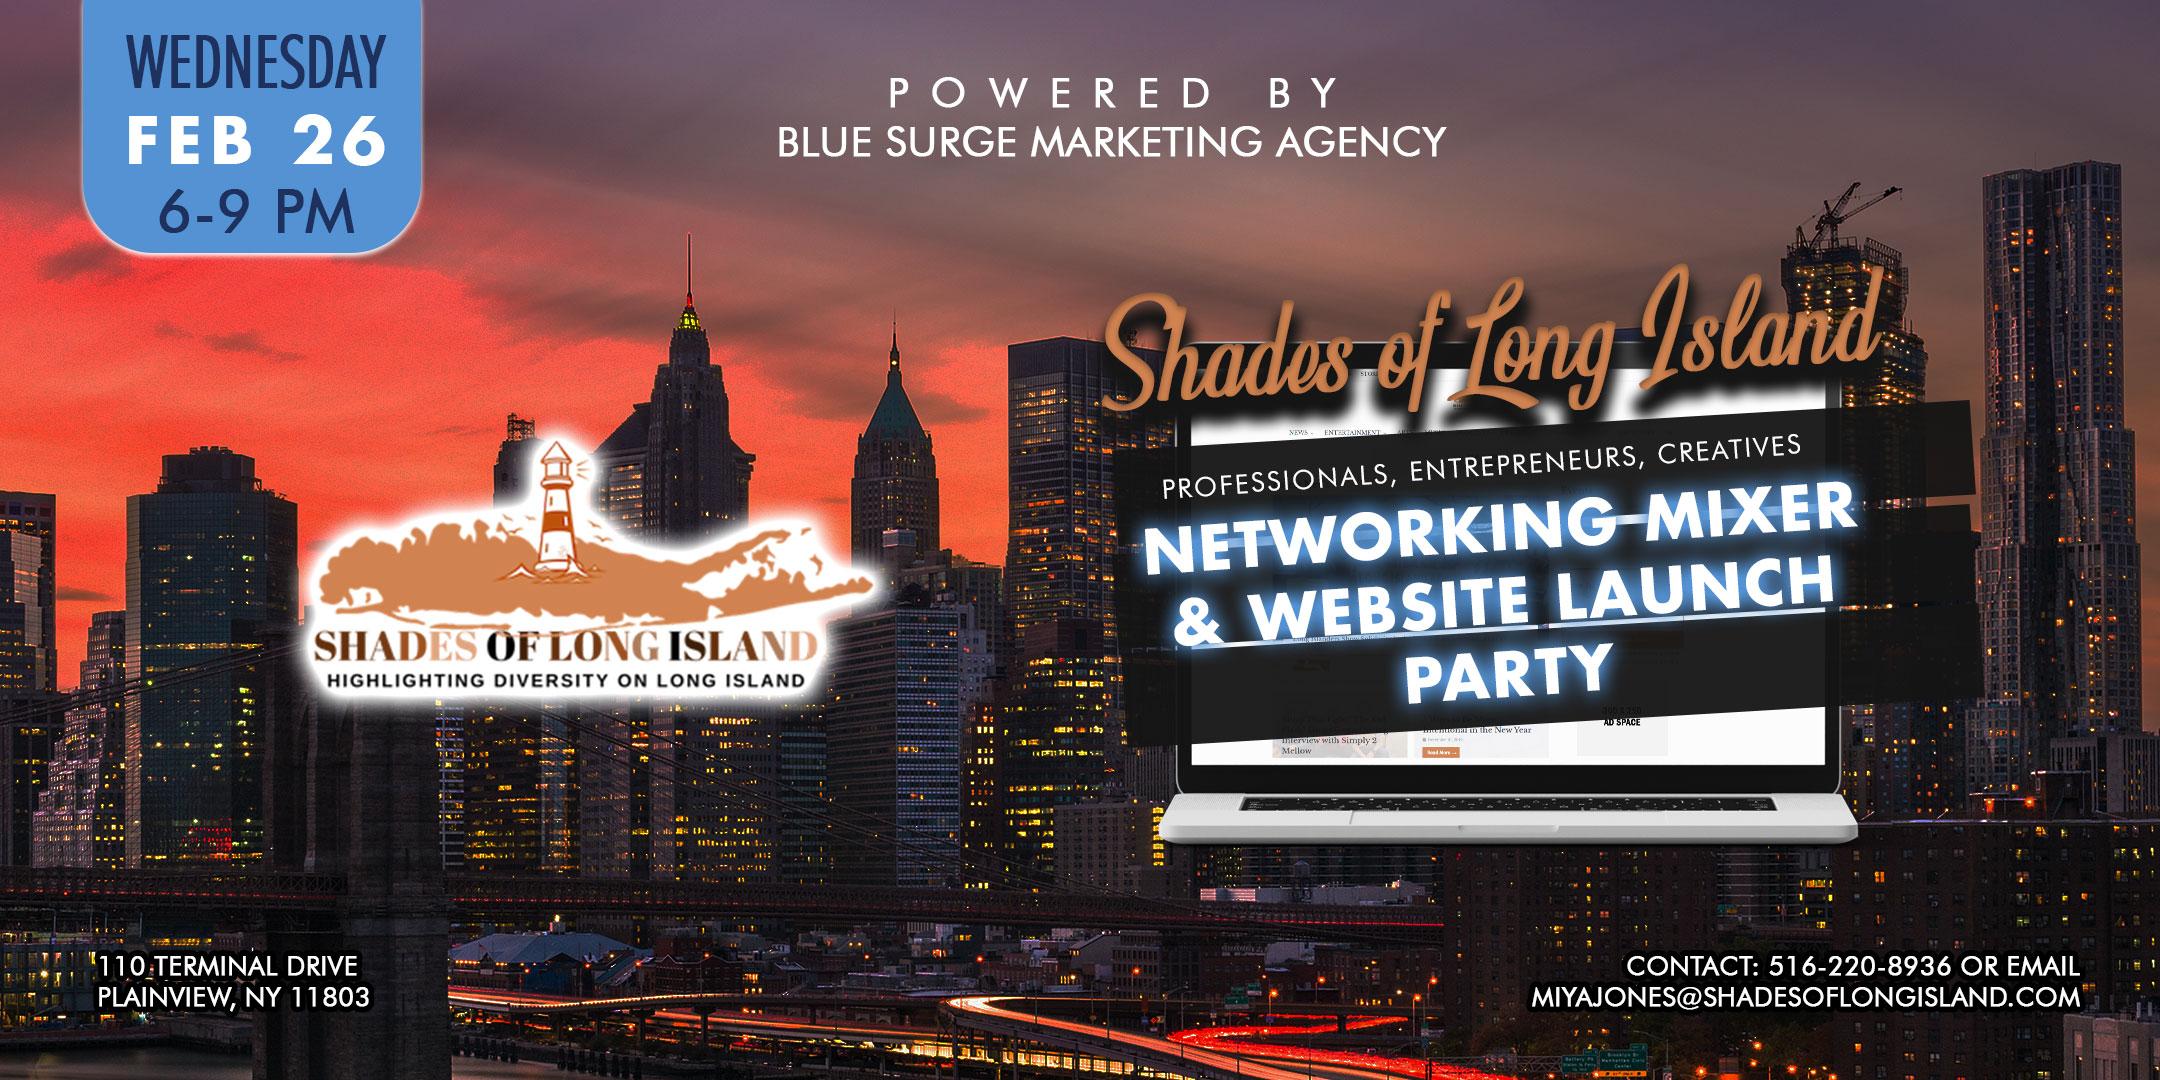 eventbrite-header-website-launch-party